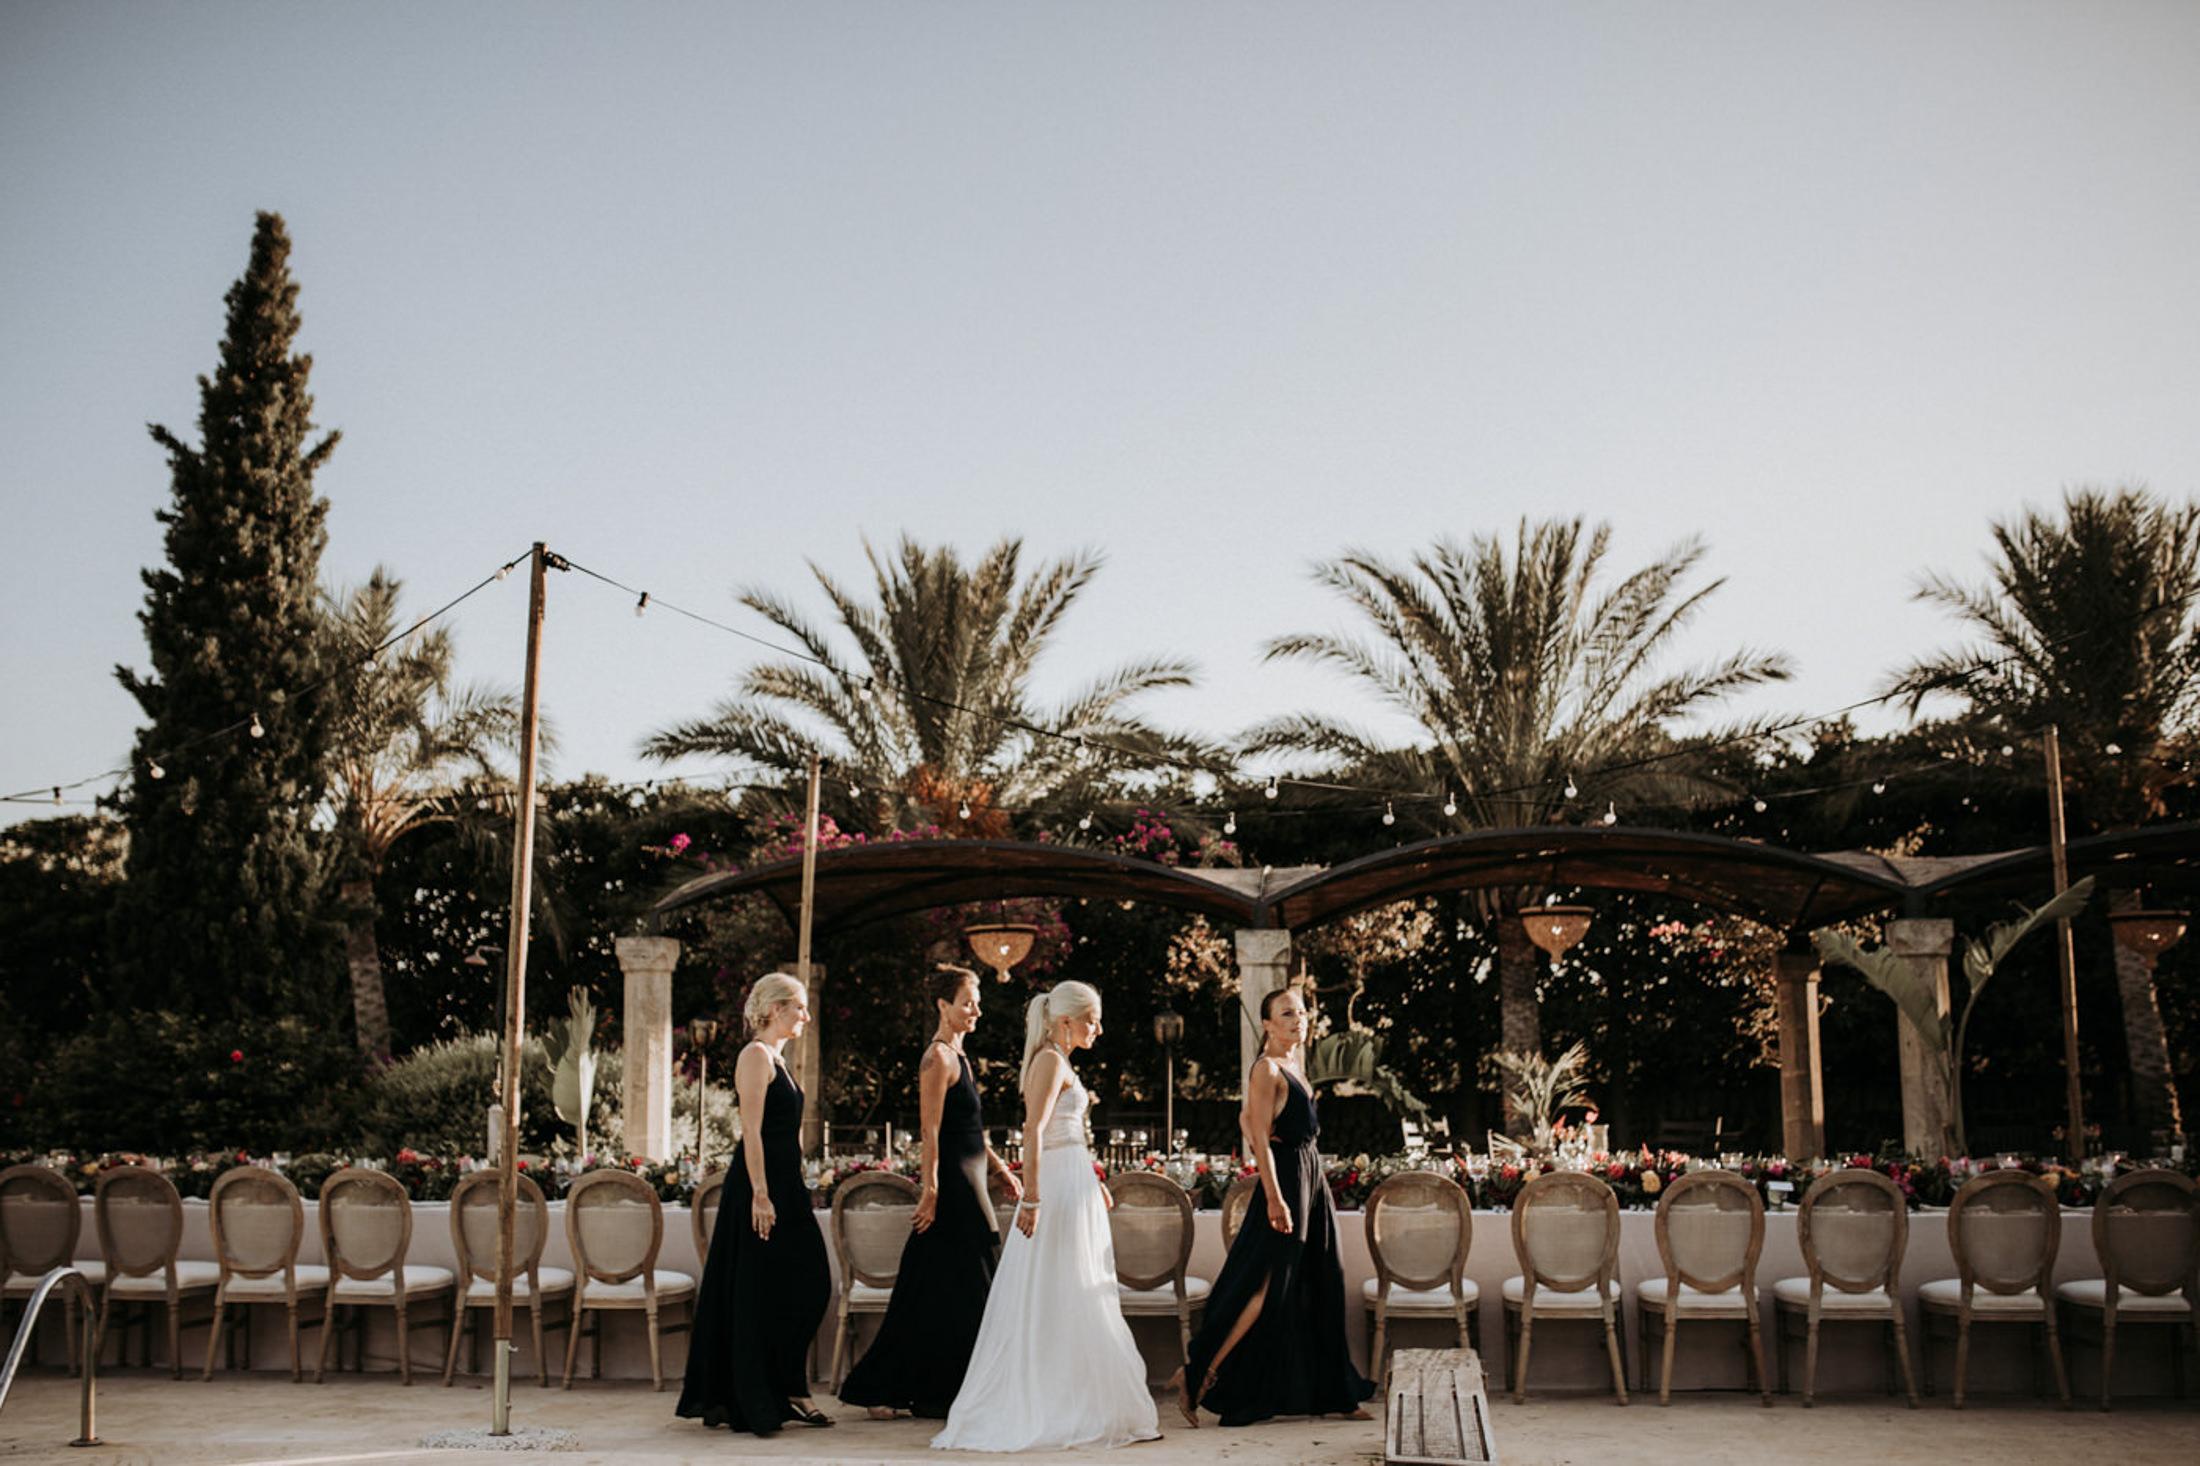 Wedding_Photographer_Mallorca_Daniela-Marquardt_Photography_New_York_Iceland_Tuscany_Santorini_Portugal_Austria_Bavaria_Elopement_Hochzeitsfotograf_AntjeRajat2_107